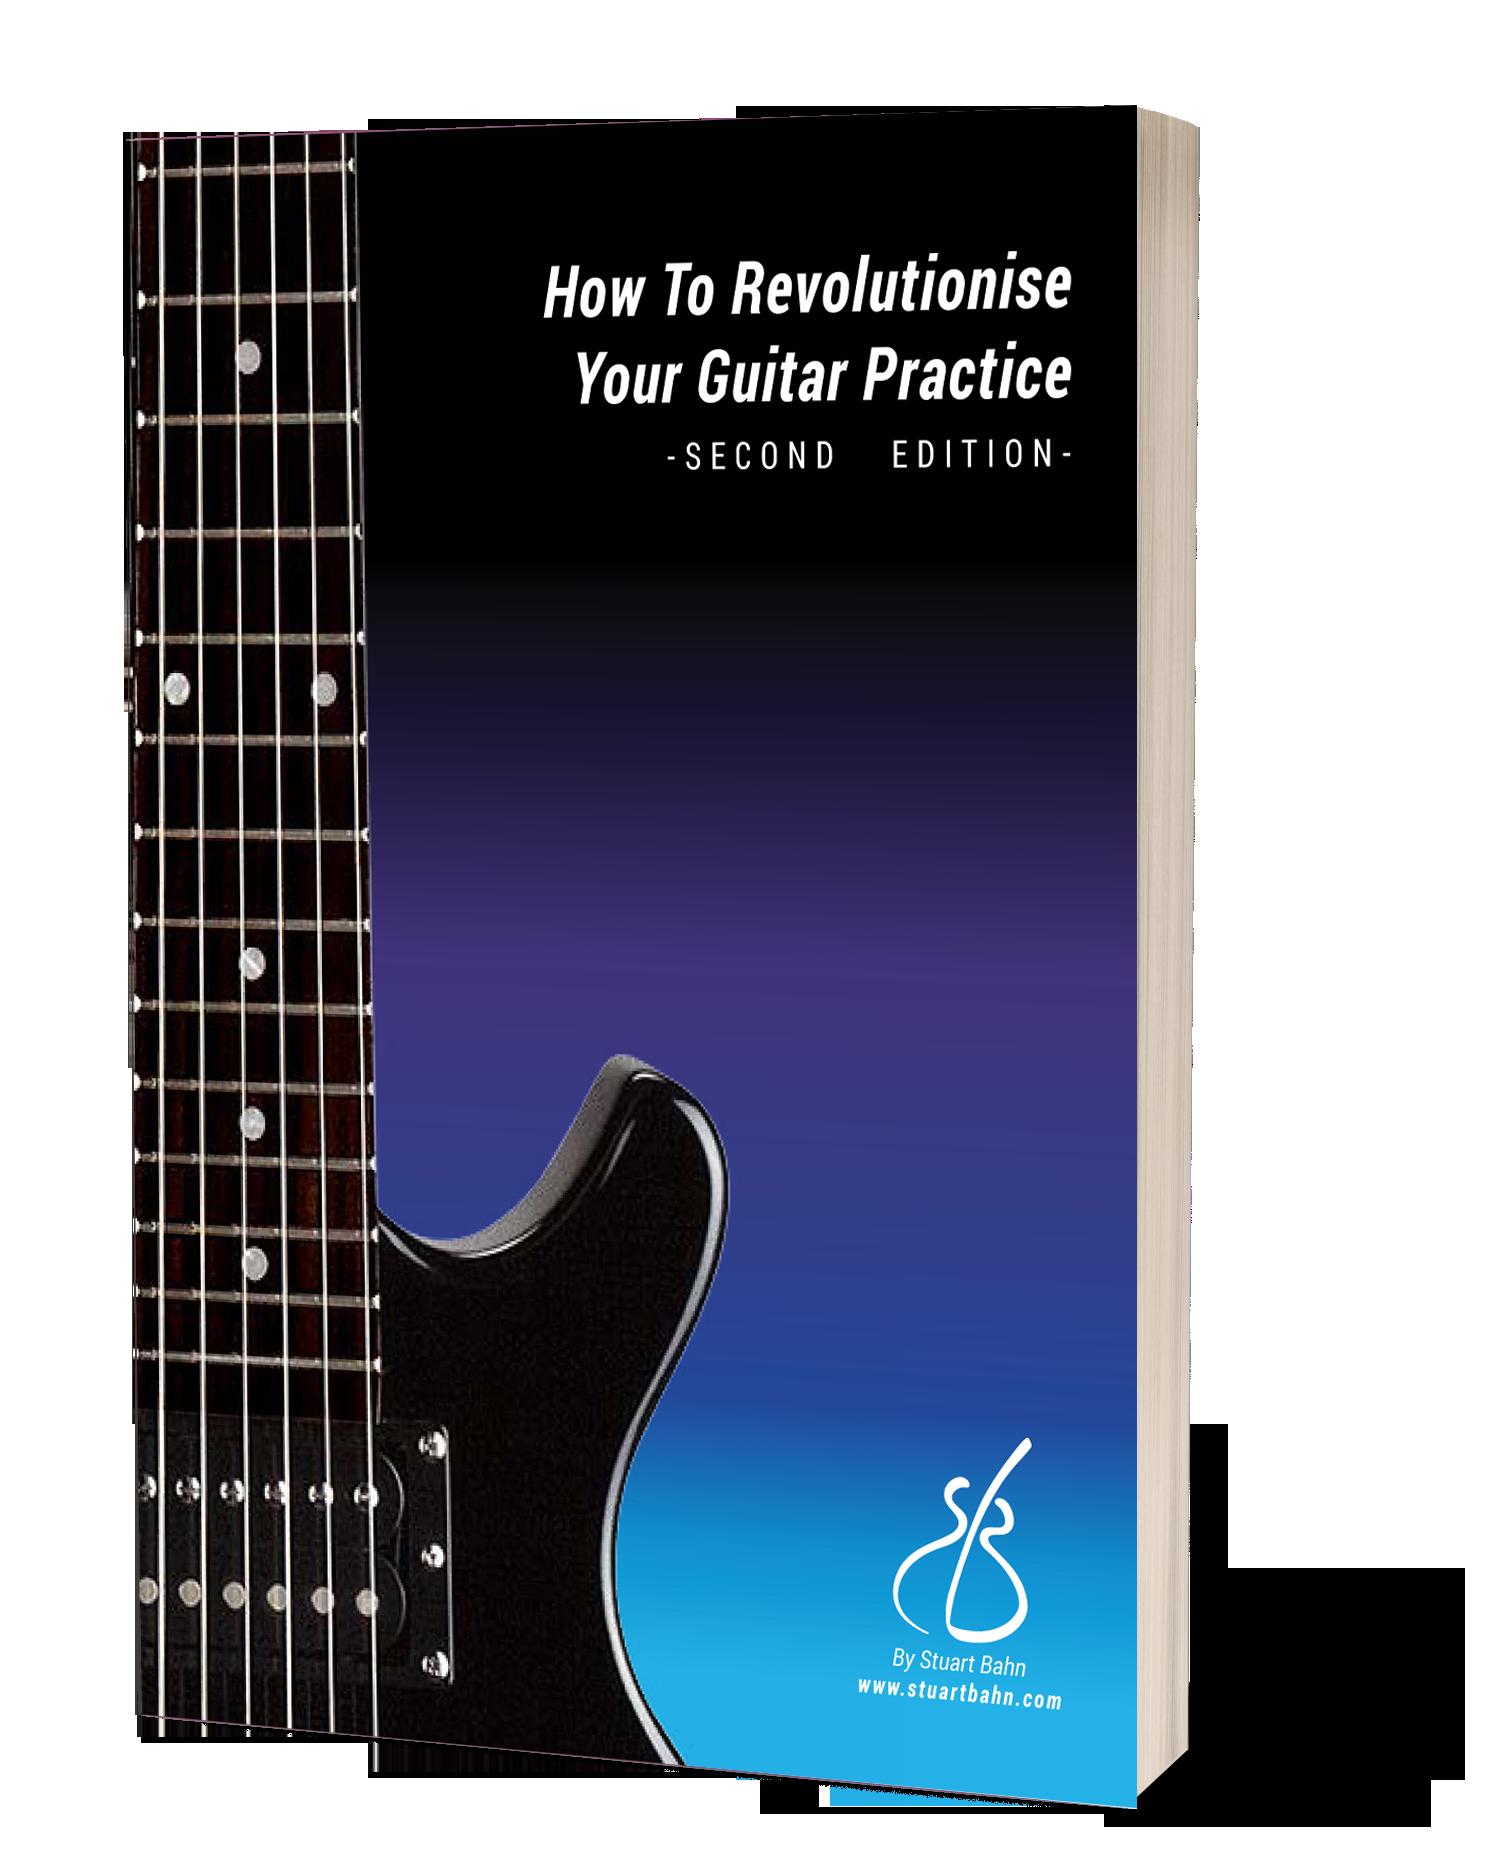 Guitar practice ebook